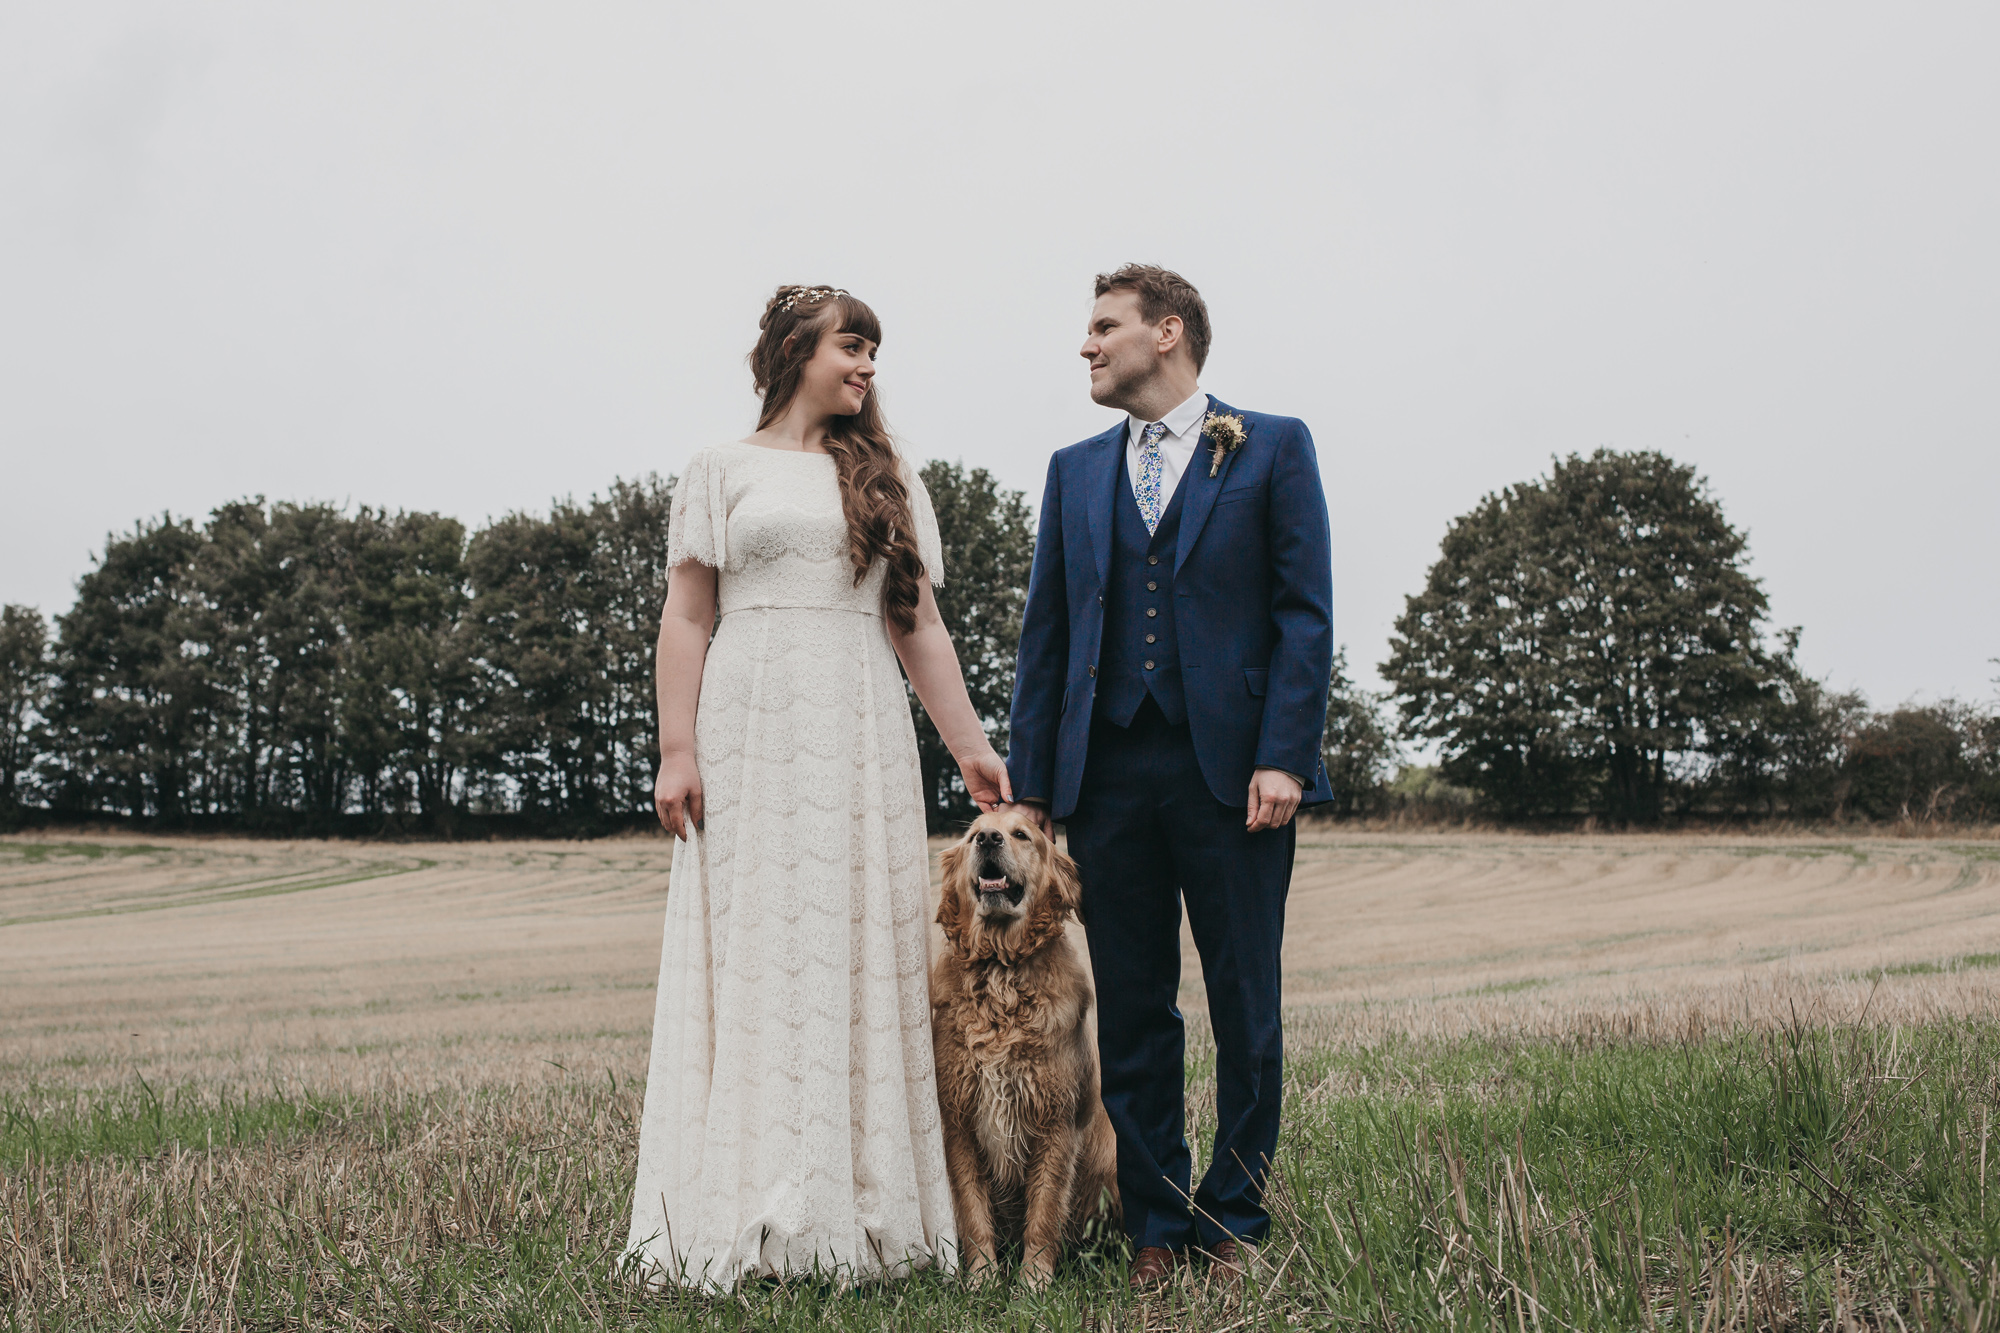 Kristy-Back-Garden-Outdoor-Wedding-Sheffield-Industrial-Warehouse-Wedding-Bohemian-Kate-Beaumont-Dahlia-Dress-30.jpg